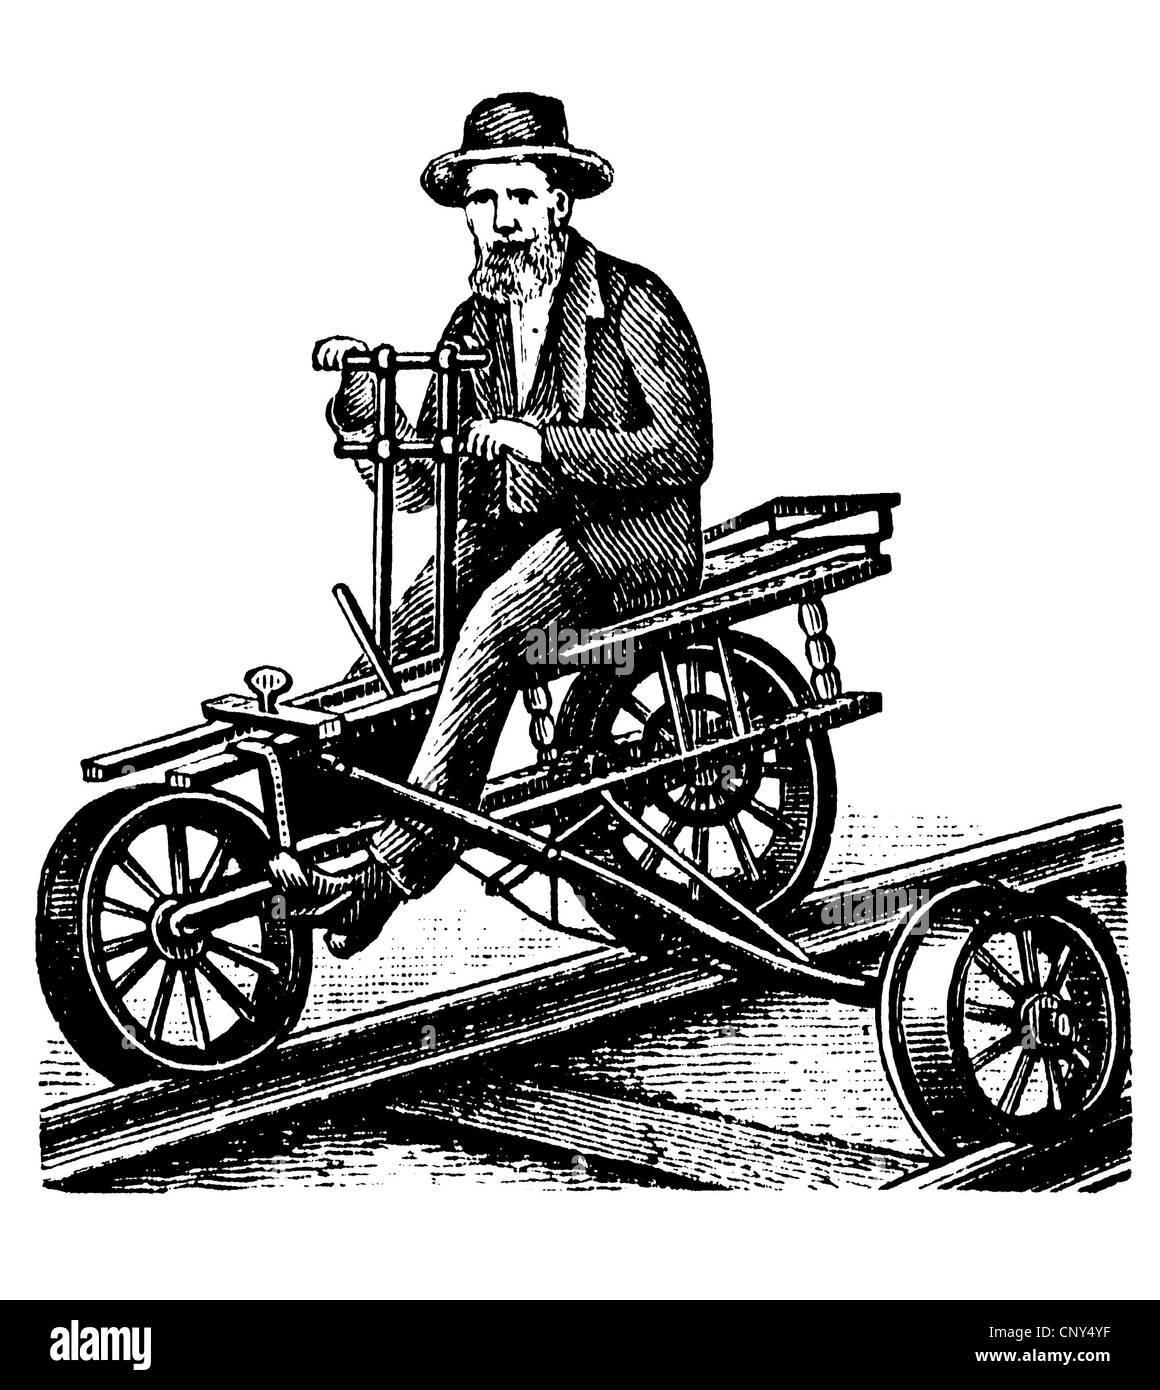 Velocipede or draisine, historical wood engraving, circa 1888 - Stock Image